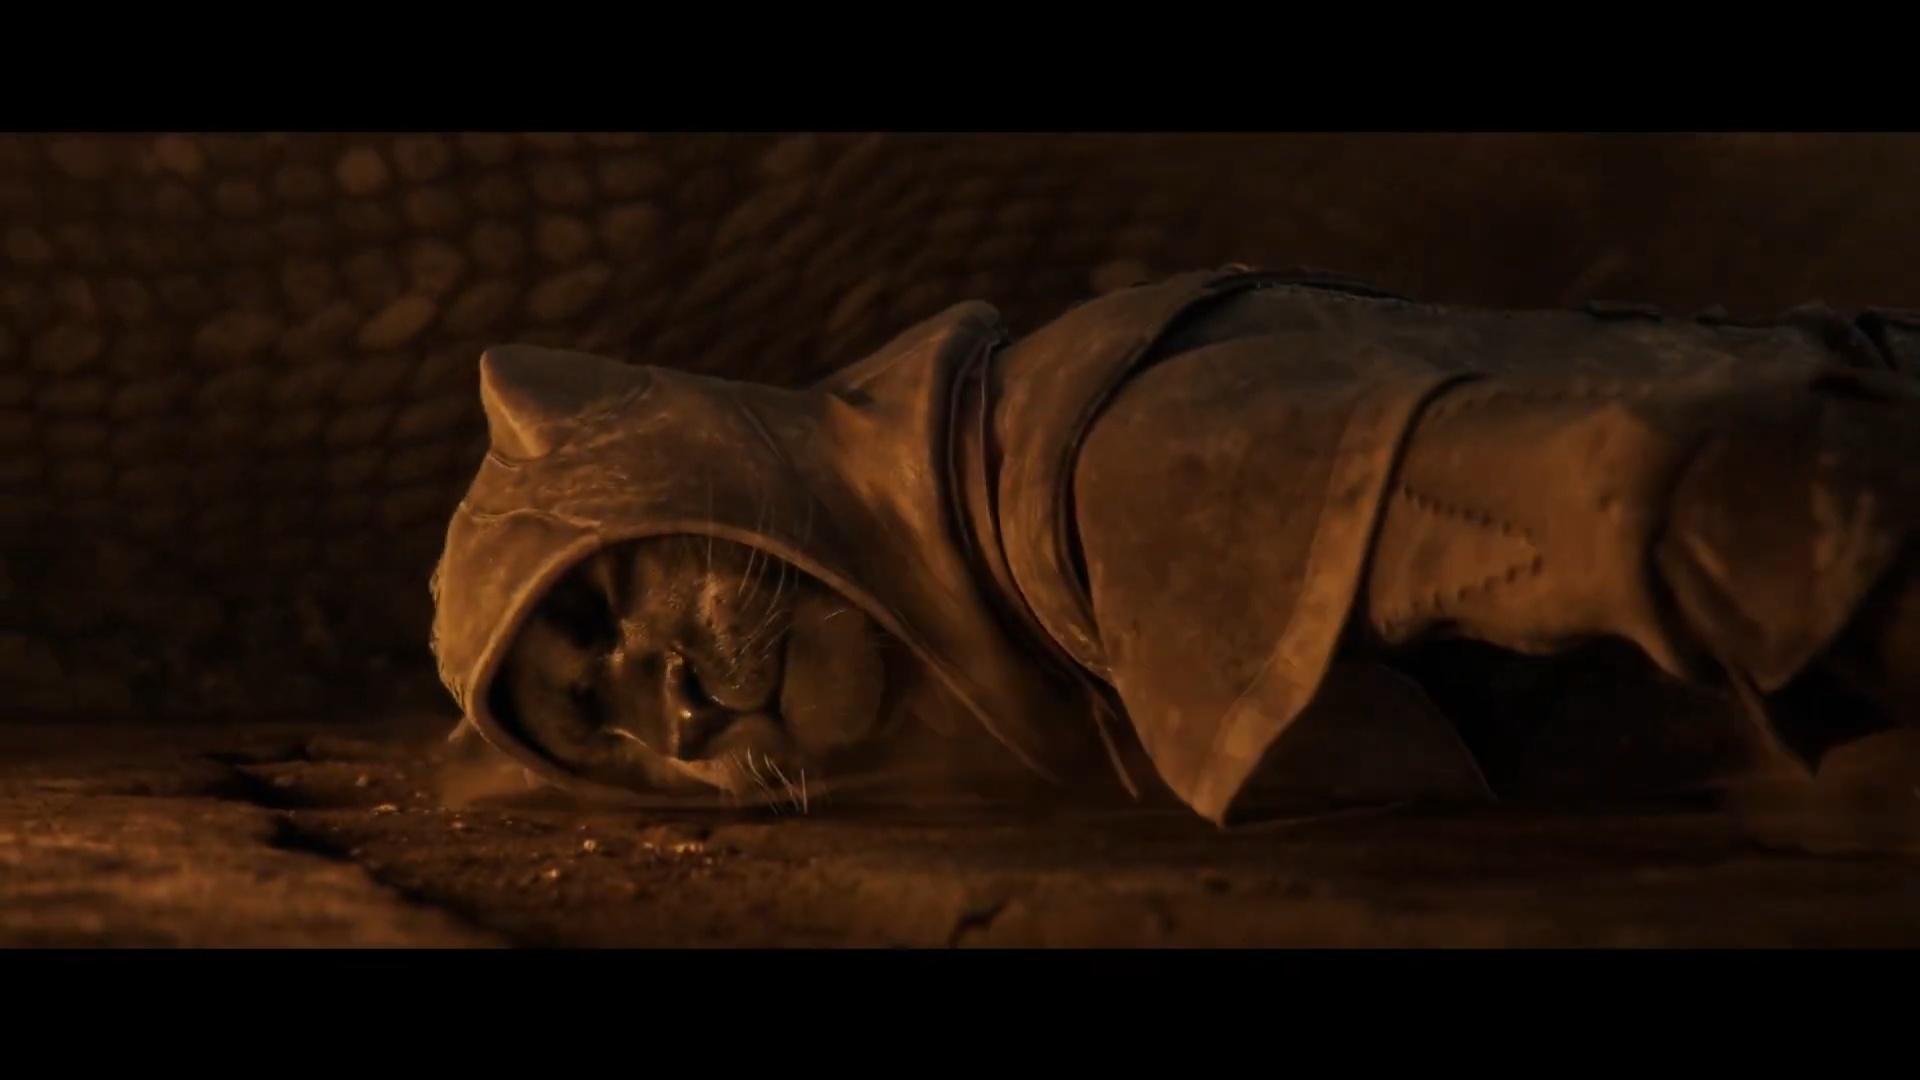 20190611222655.jpg - Elder Scrolls Online, the